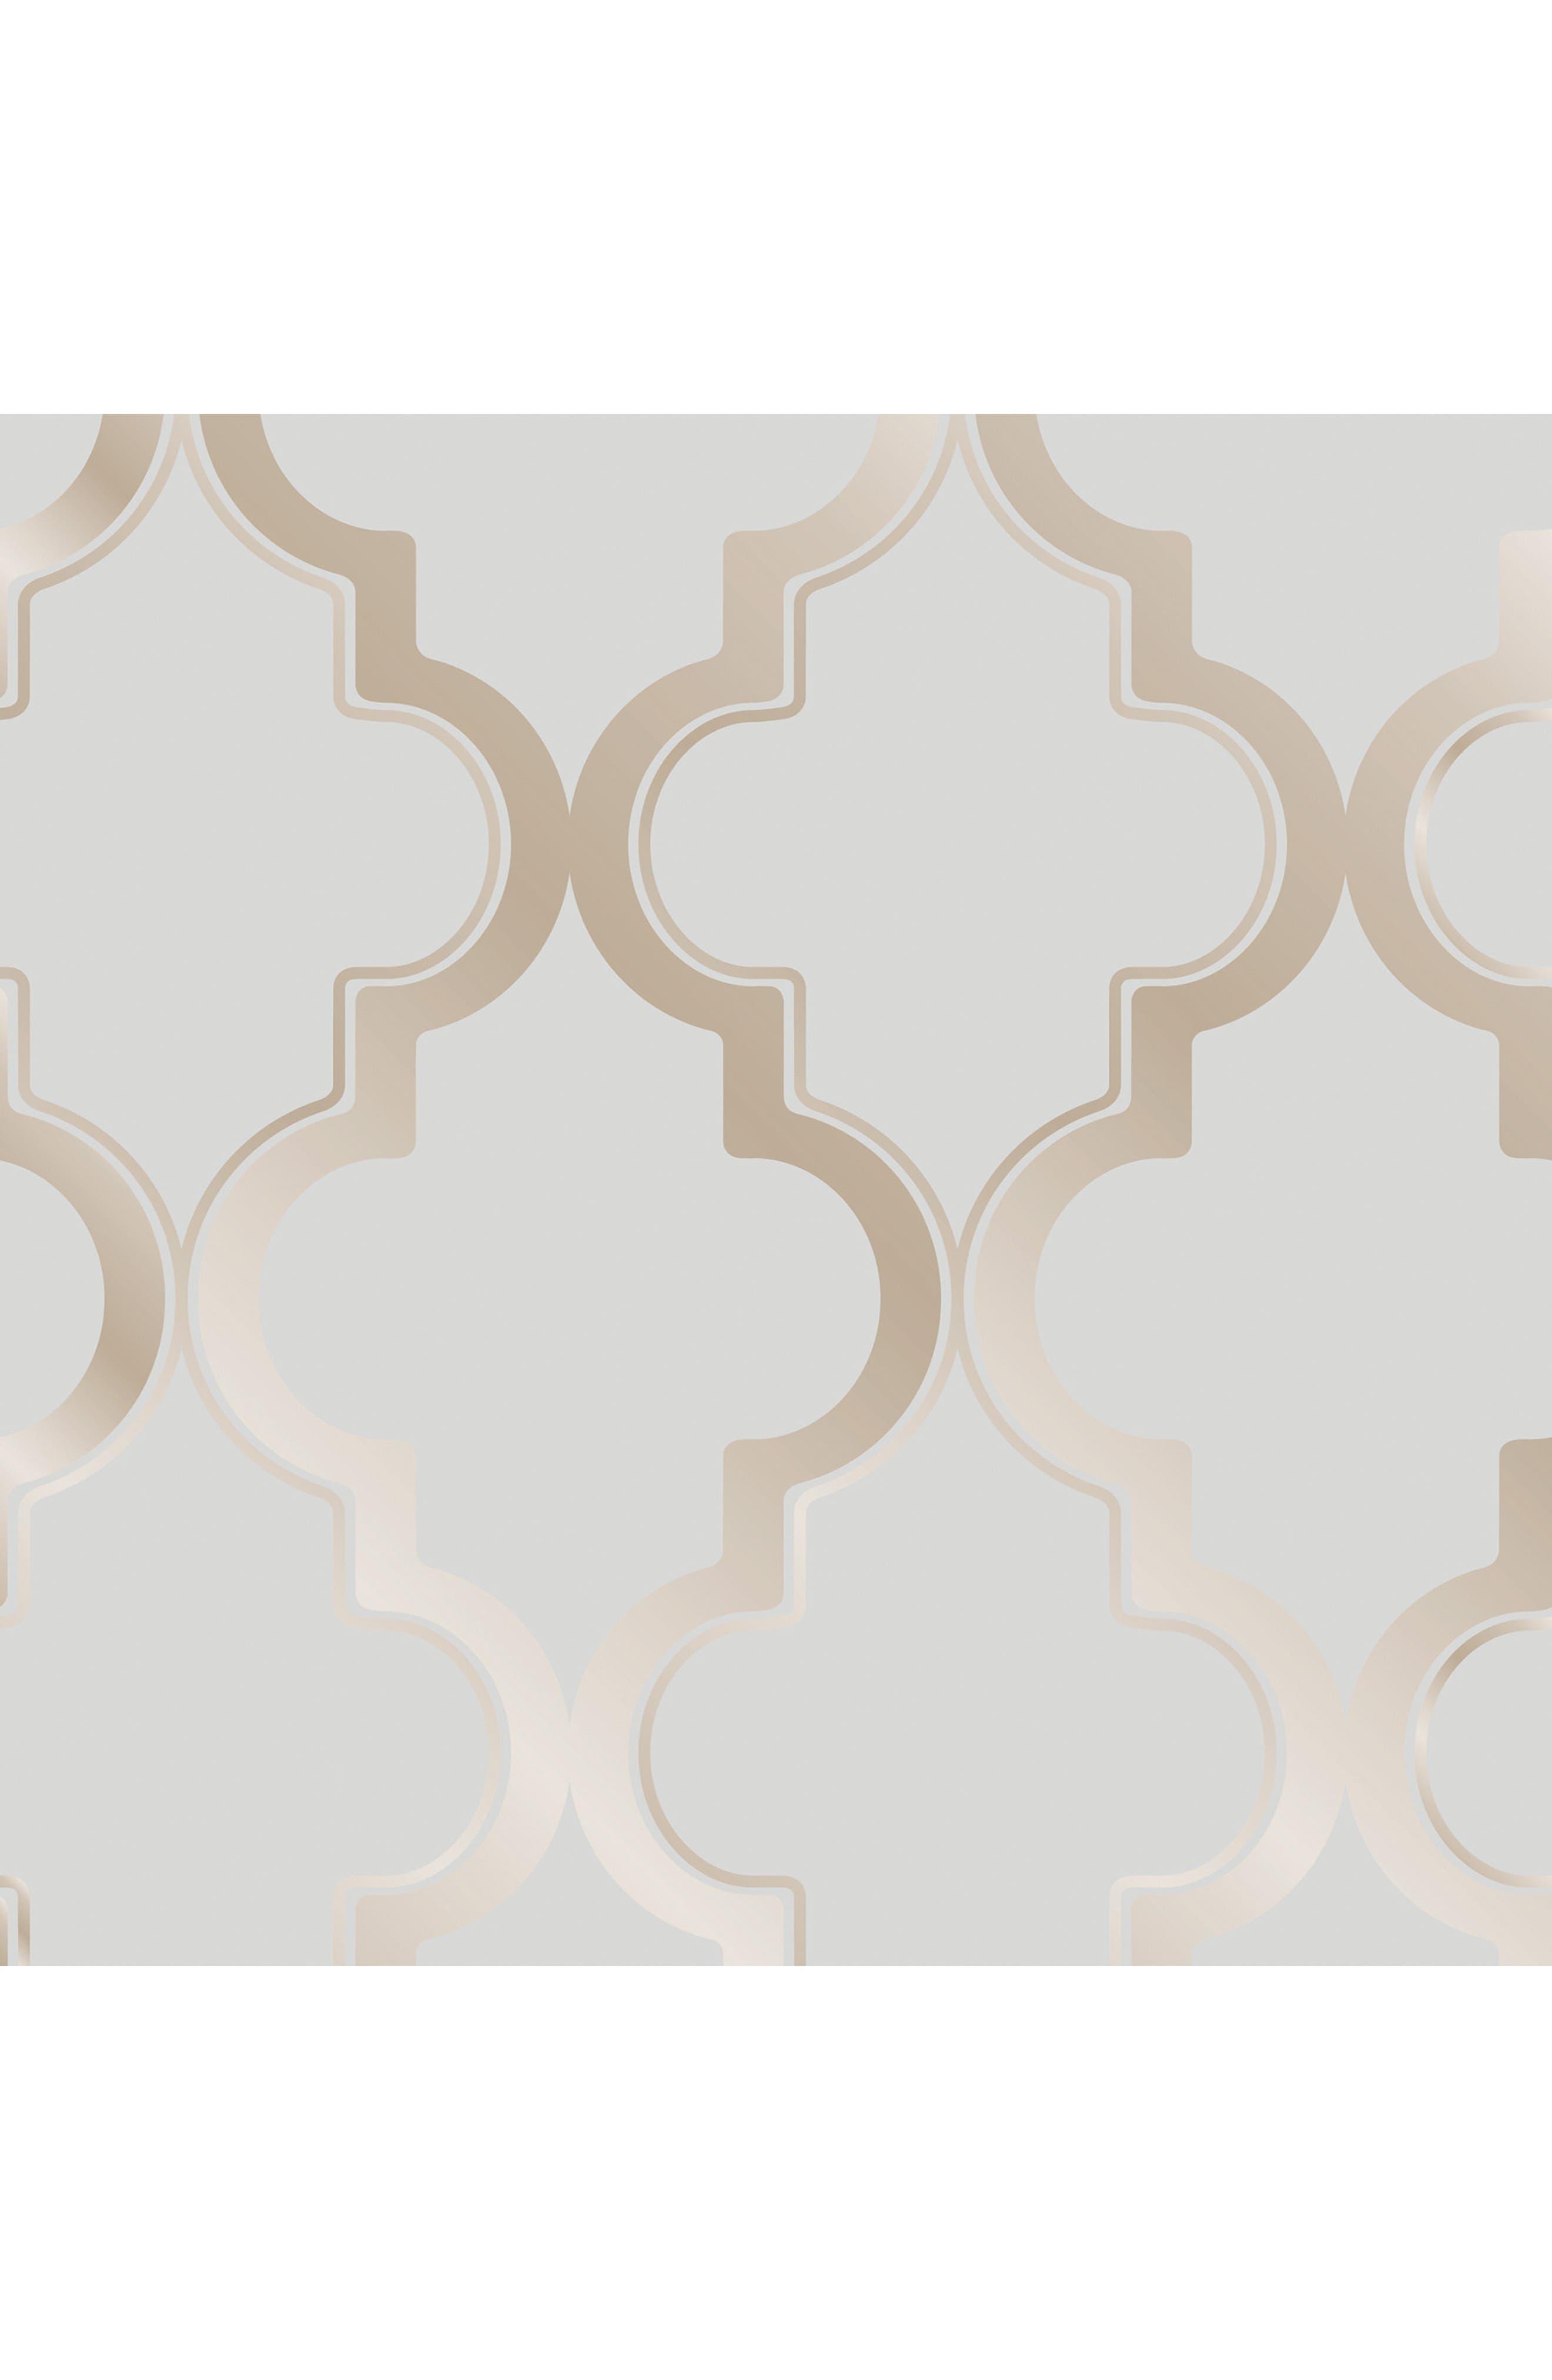 Marrakesh Self-Adhesive Vinyl Wallpaper,                             Main thumbnail 1, color,                             020